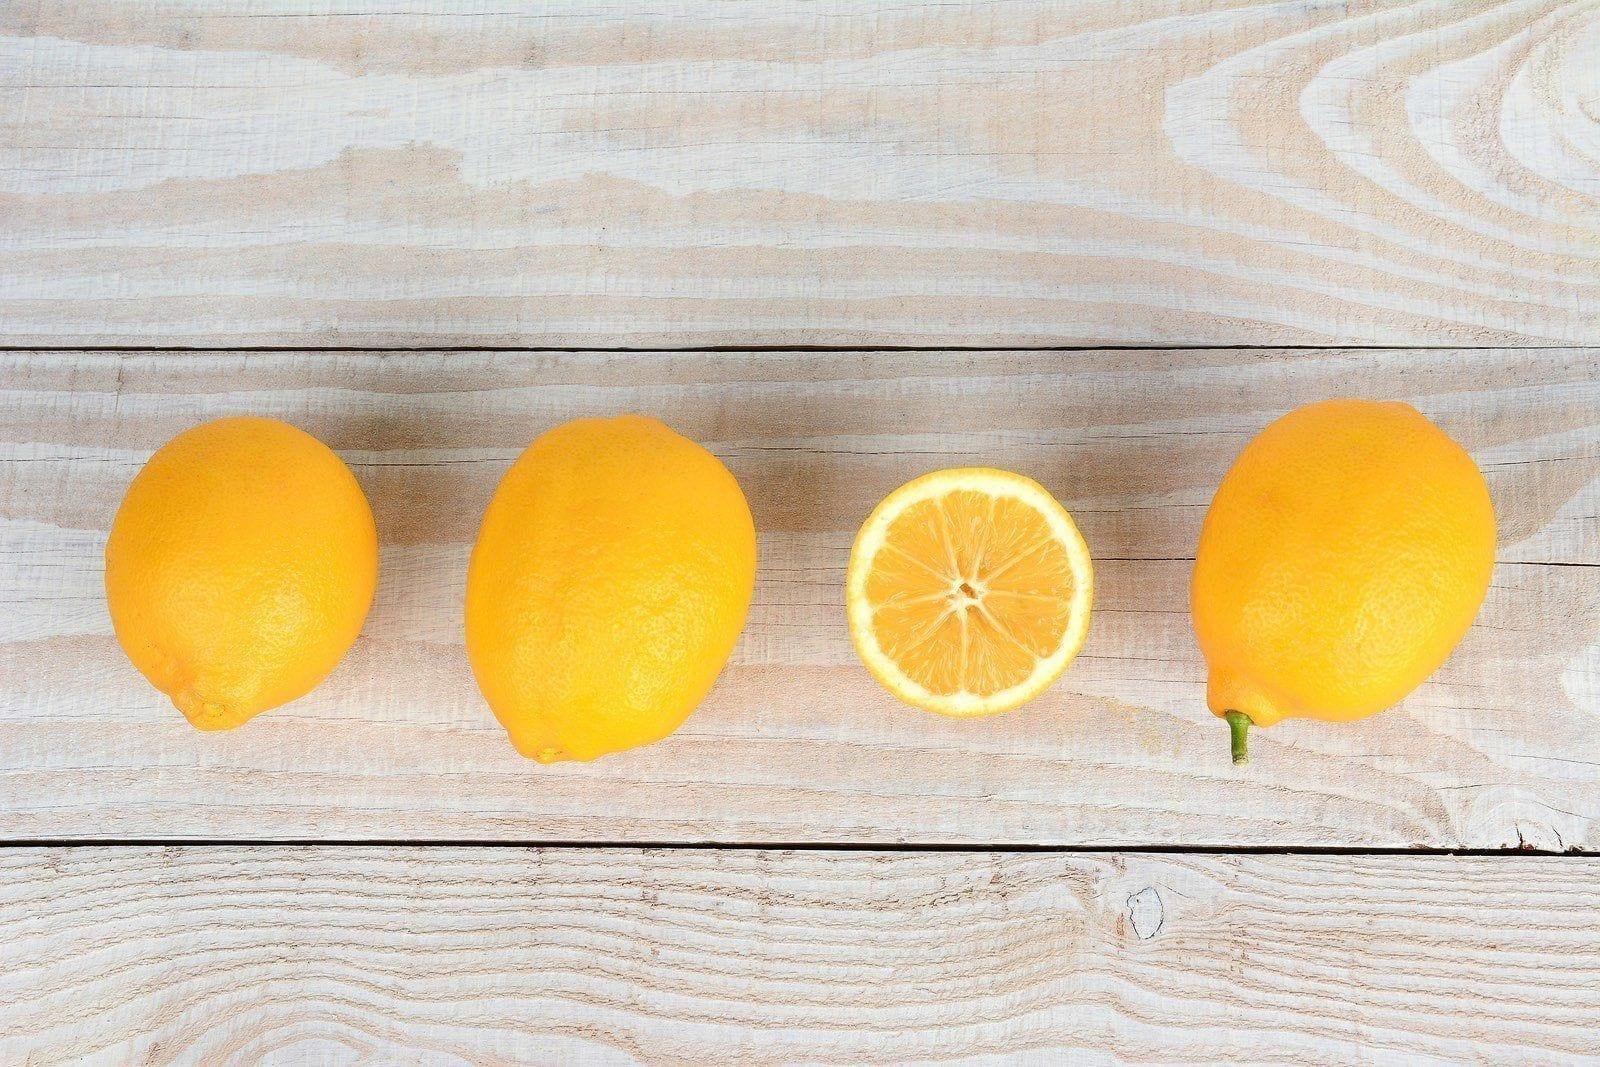 Alasan Unik Kenapa Buah Lemon Sering Digunakan untuk Produk Kebersihan!